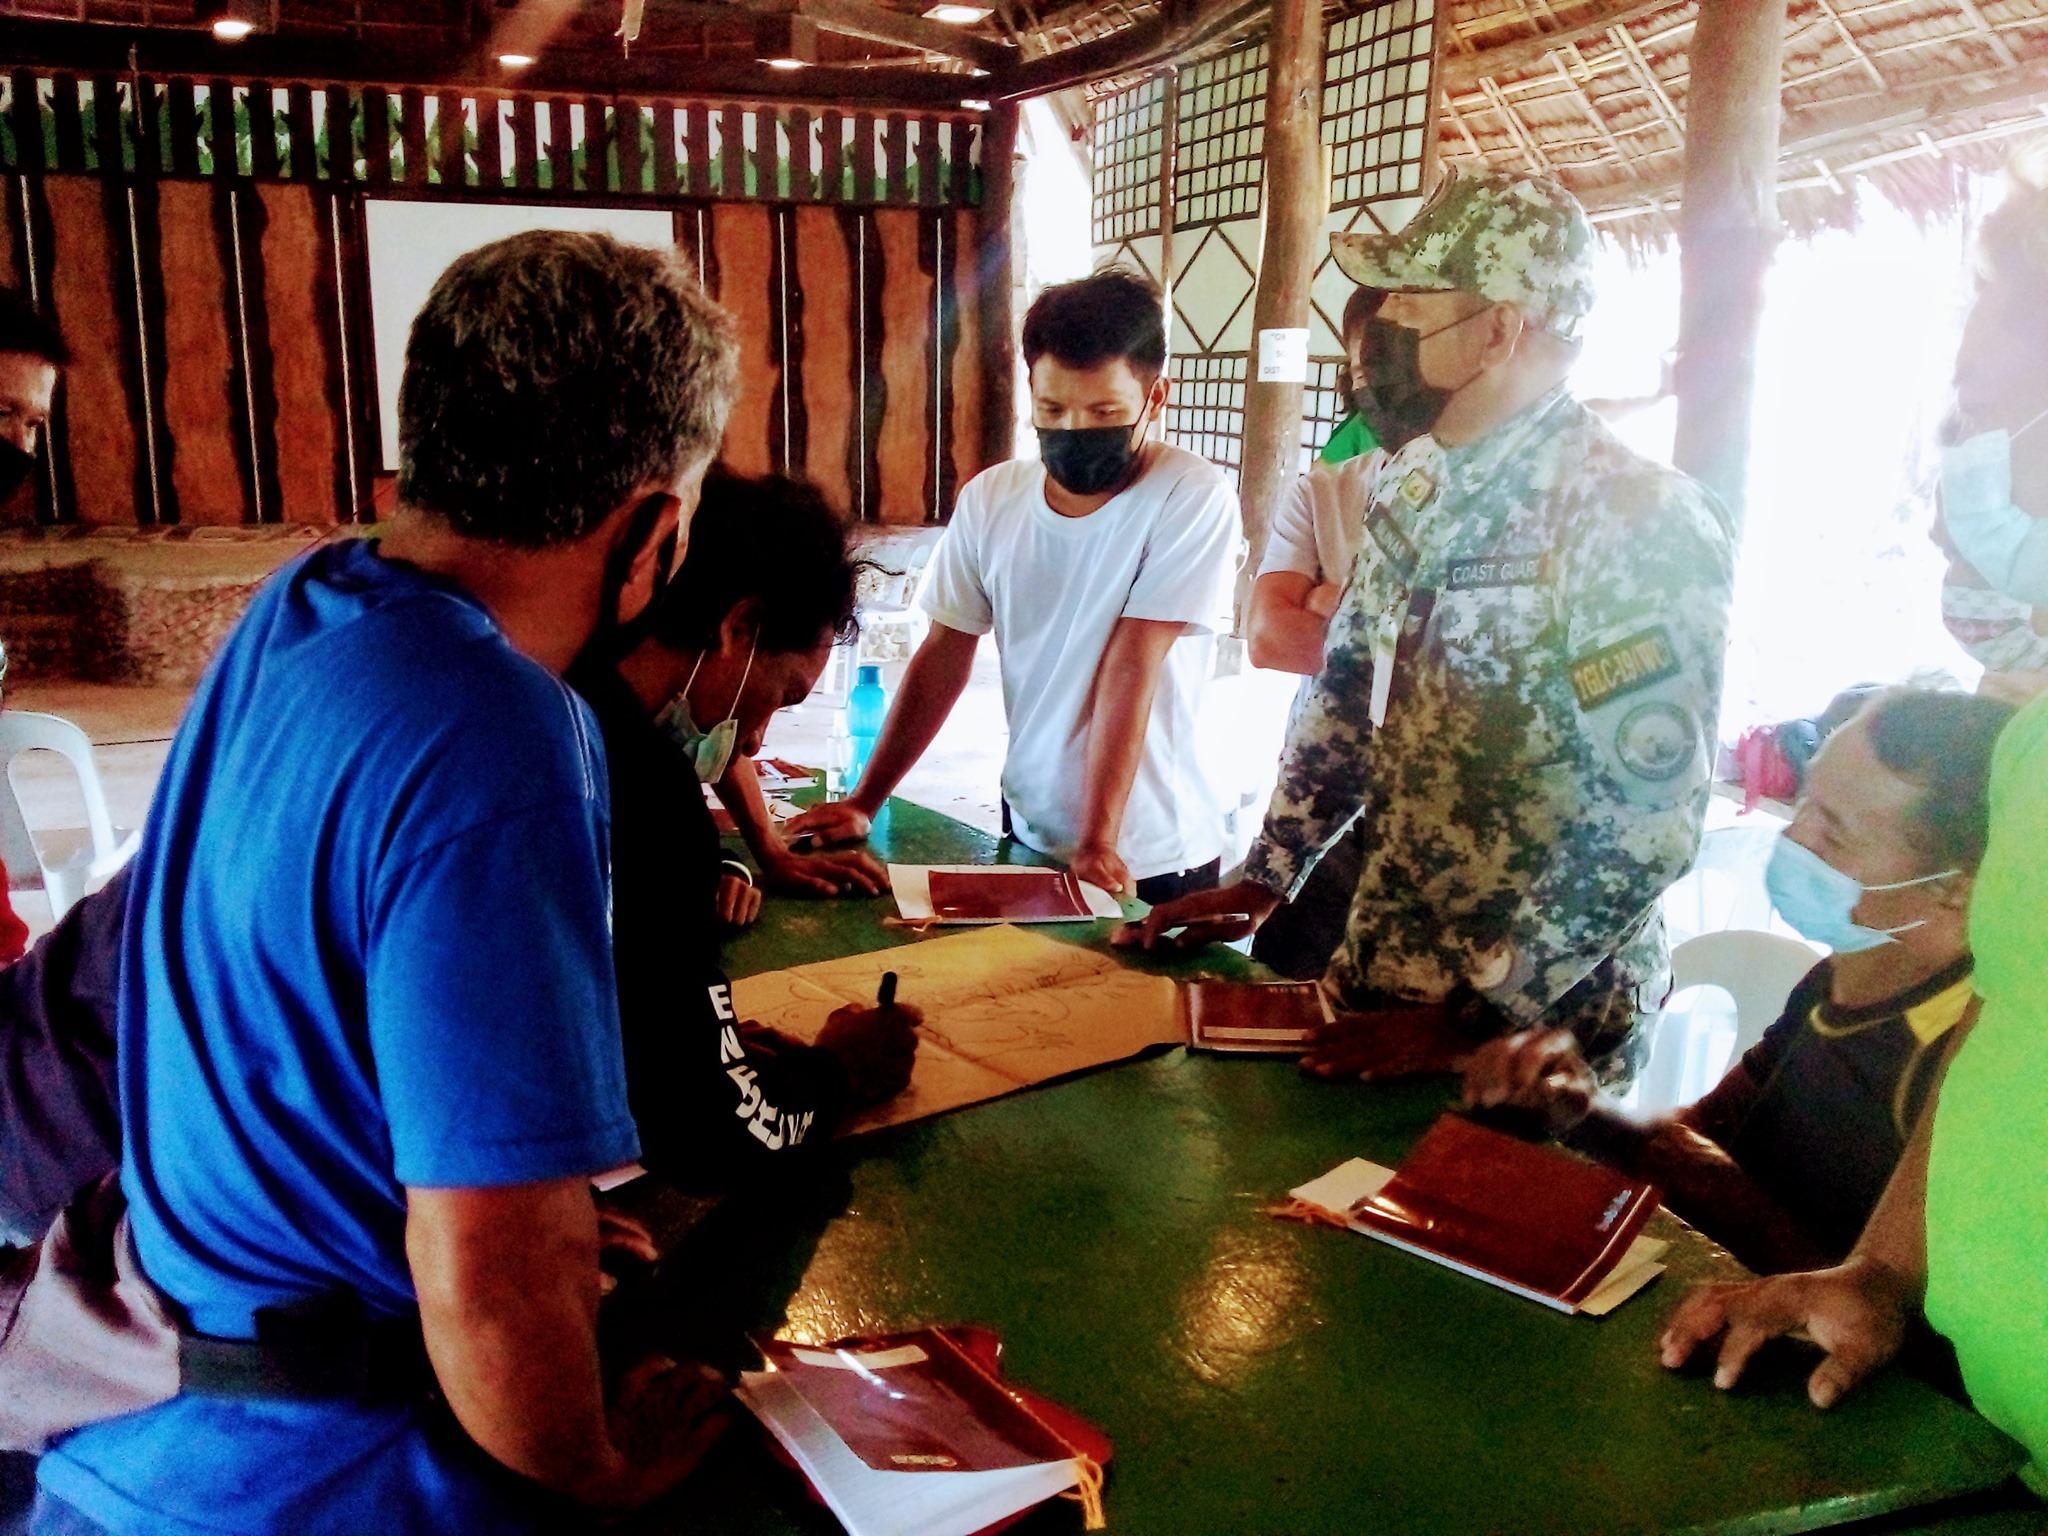 39Bantay Dagat in Argao Deputized during the Coastal Law Enforcement Training